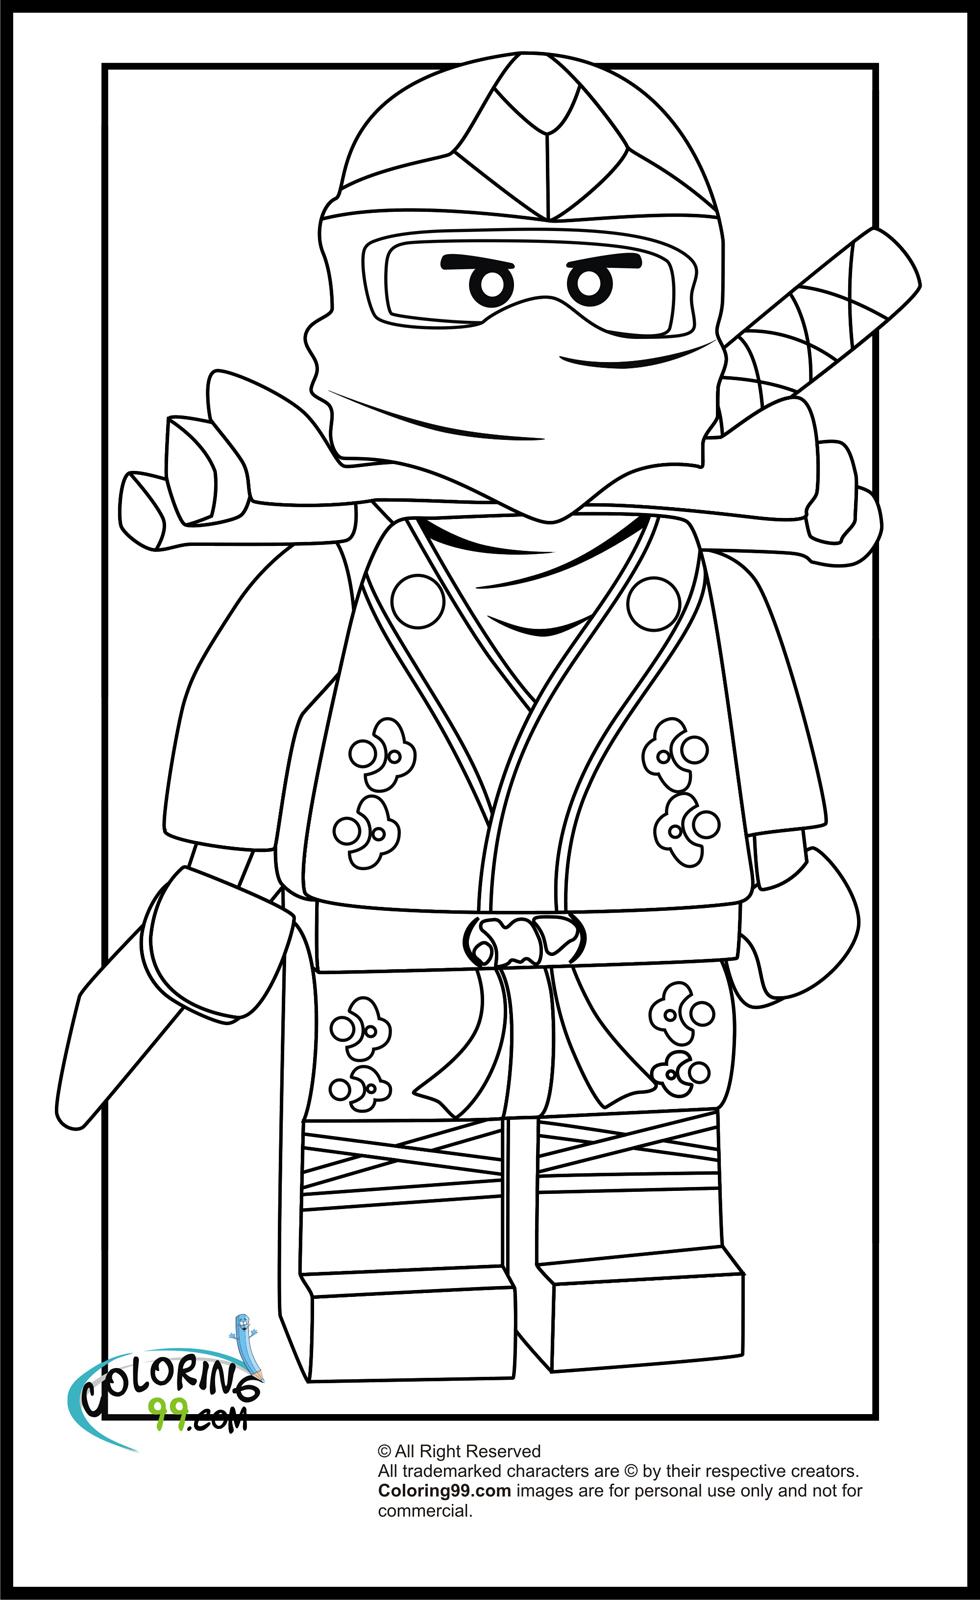 LEGO Ninjago Lloyd The Green Ninja Coloring Pages  Team colors